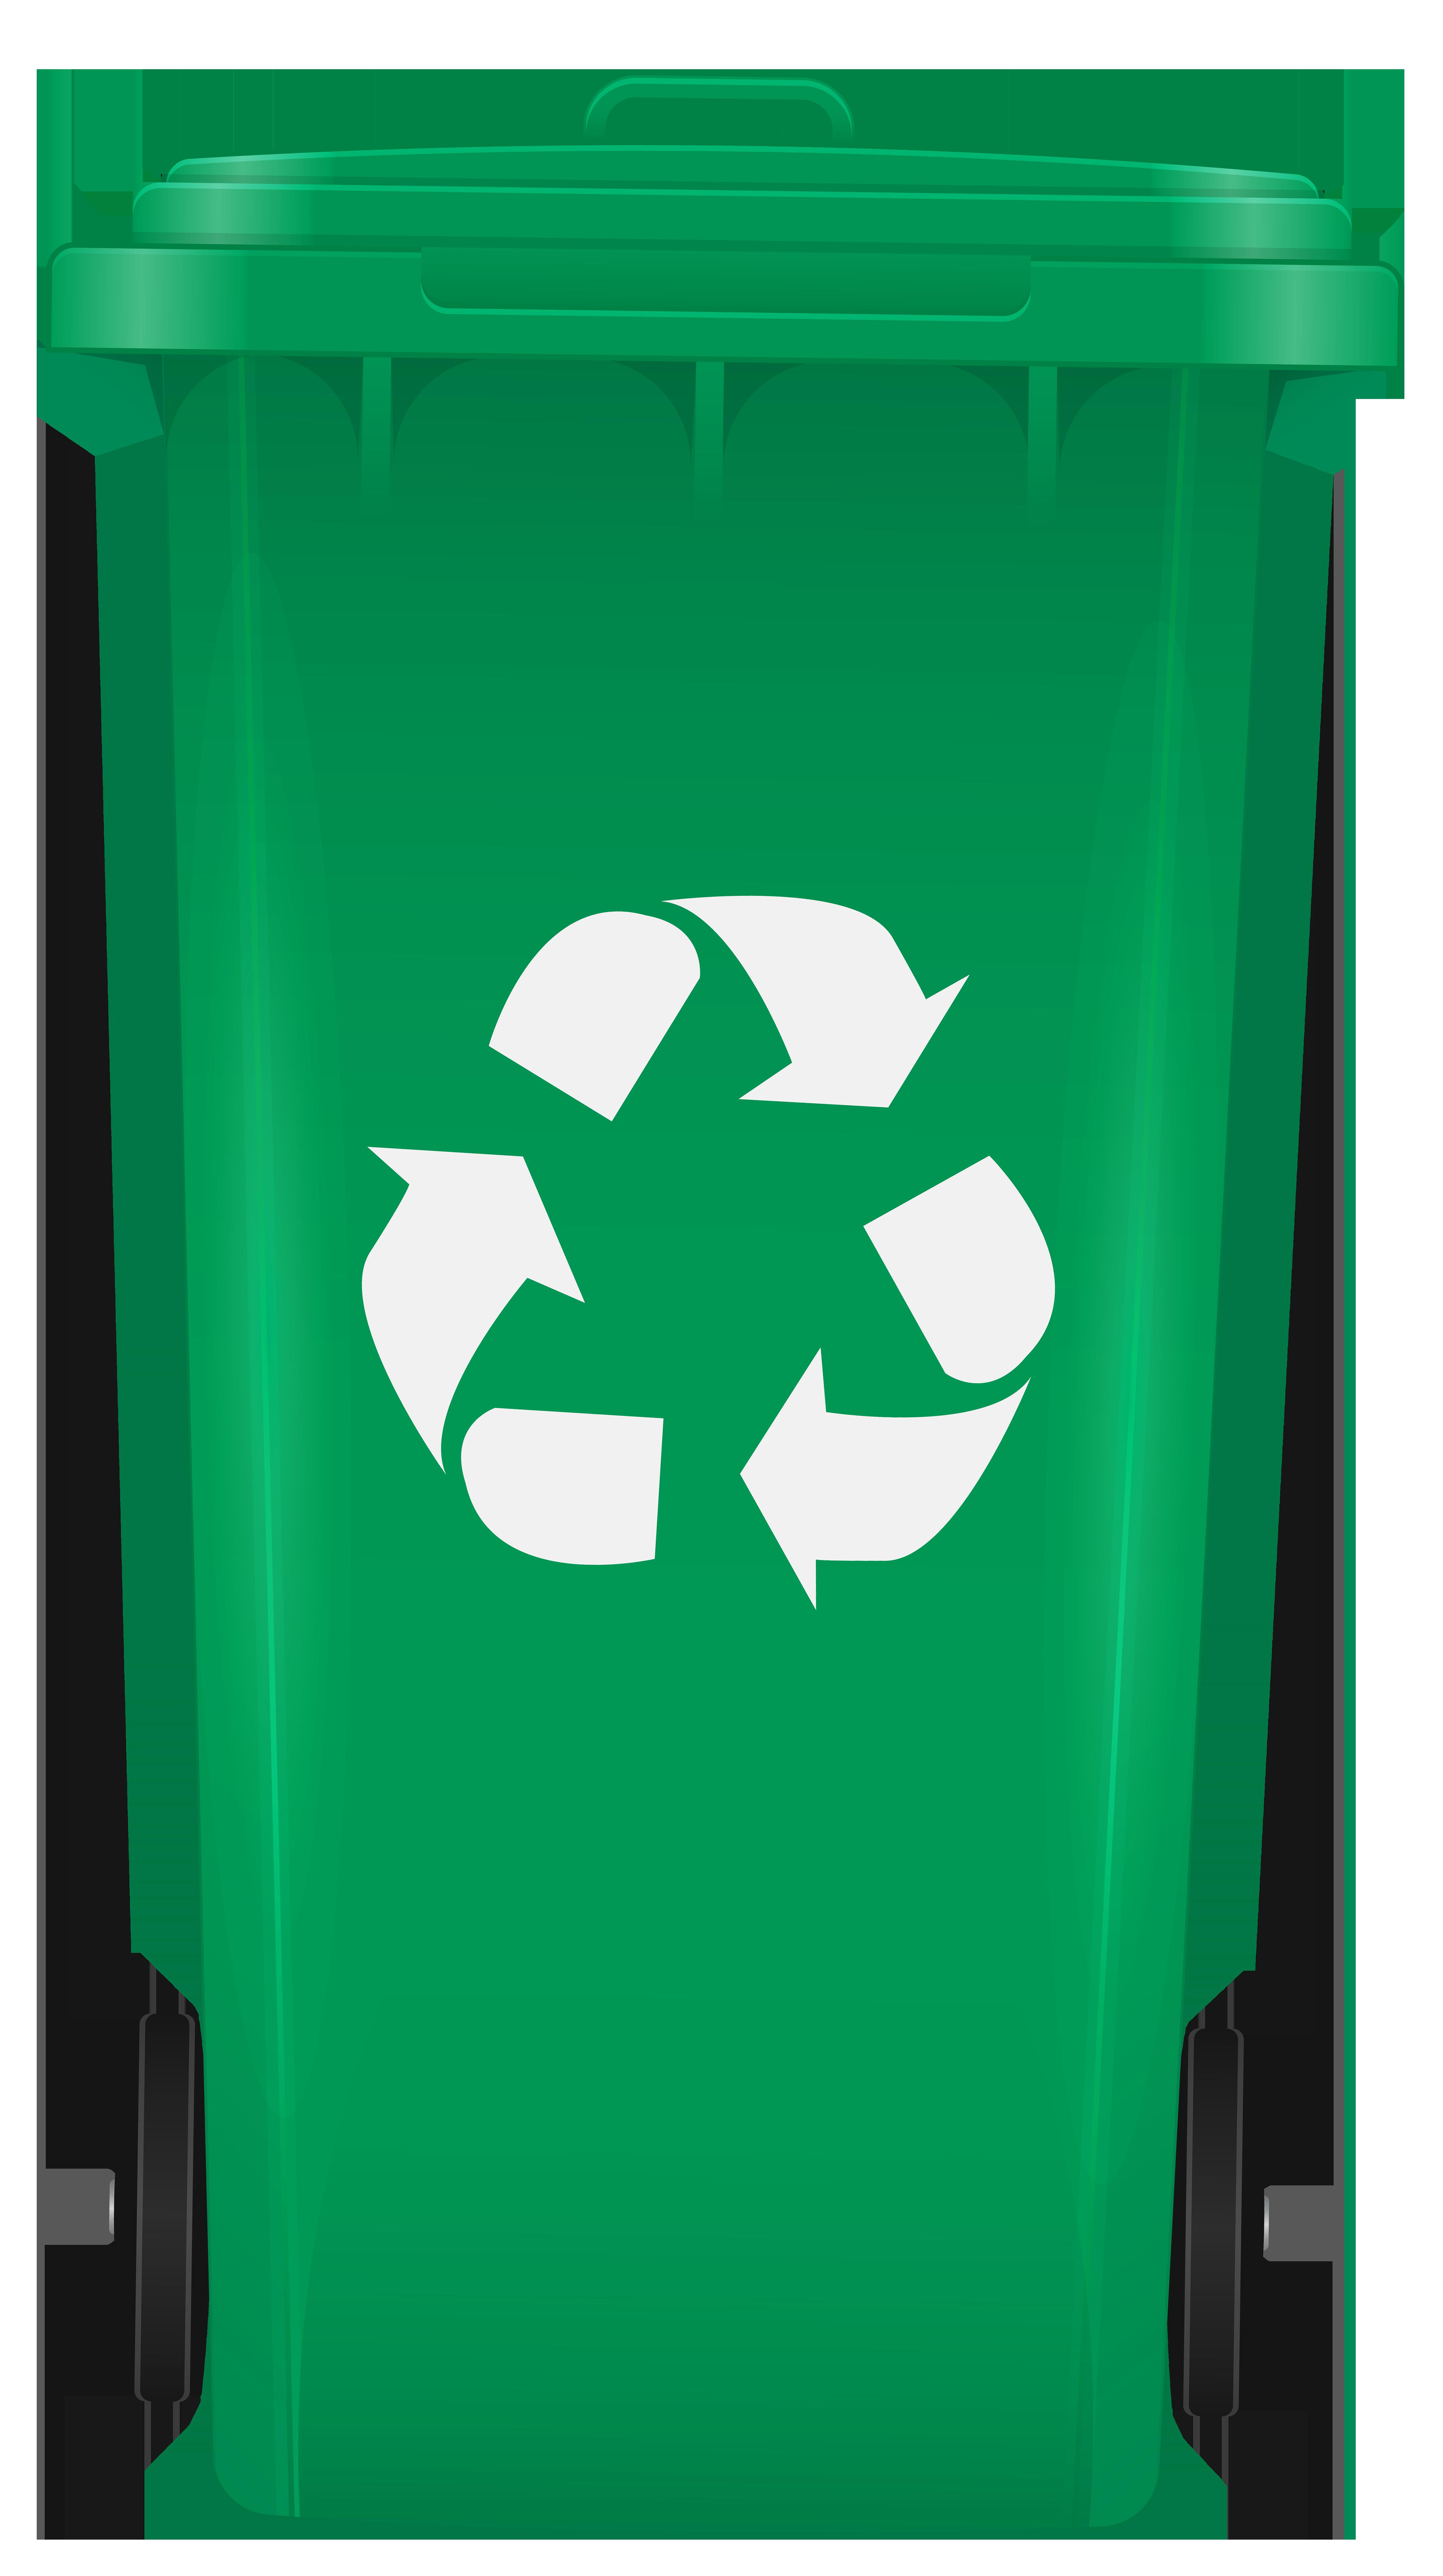 4481x8000 Recycling Bin Png Clip Art